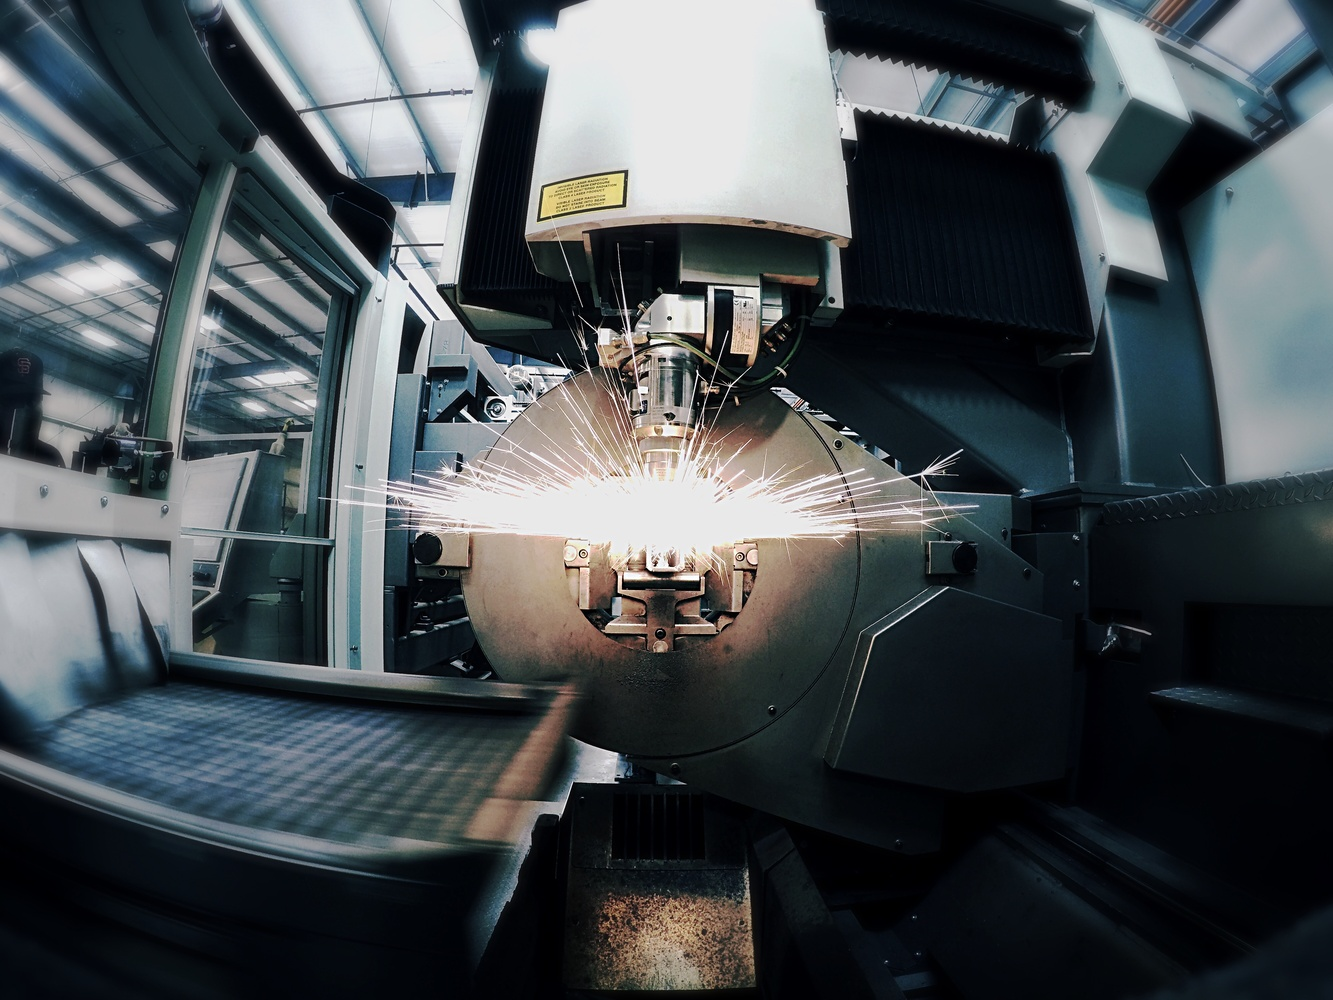 GoPro shot inside machine by Olen Hogenson